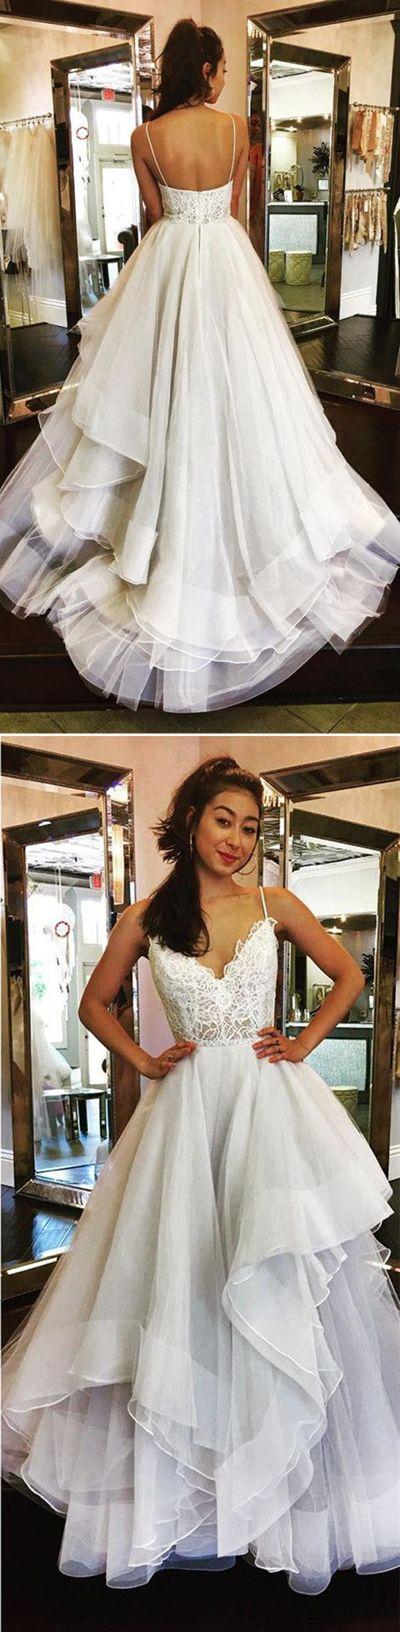 A Line Sweep Train Sweetheart Spaghetti Sleeveless Mid Back Appliques Ruffles Wedding/Prom Dress P67 Long Prom Dresses,Cheap Prom Dress,Party Dresses,Prom Gowns,Gowns Prom,Evening Dresses,Cheap Prom Dresses,Dresses for Girls,Prom Dress UK,Prom Suit,Prom Dress Brand,Prom Dress Store, Party Dress